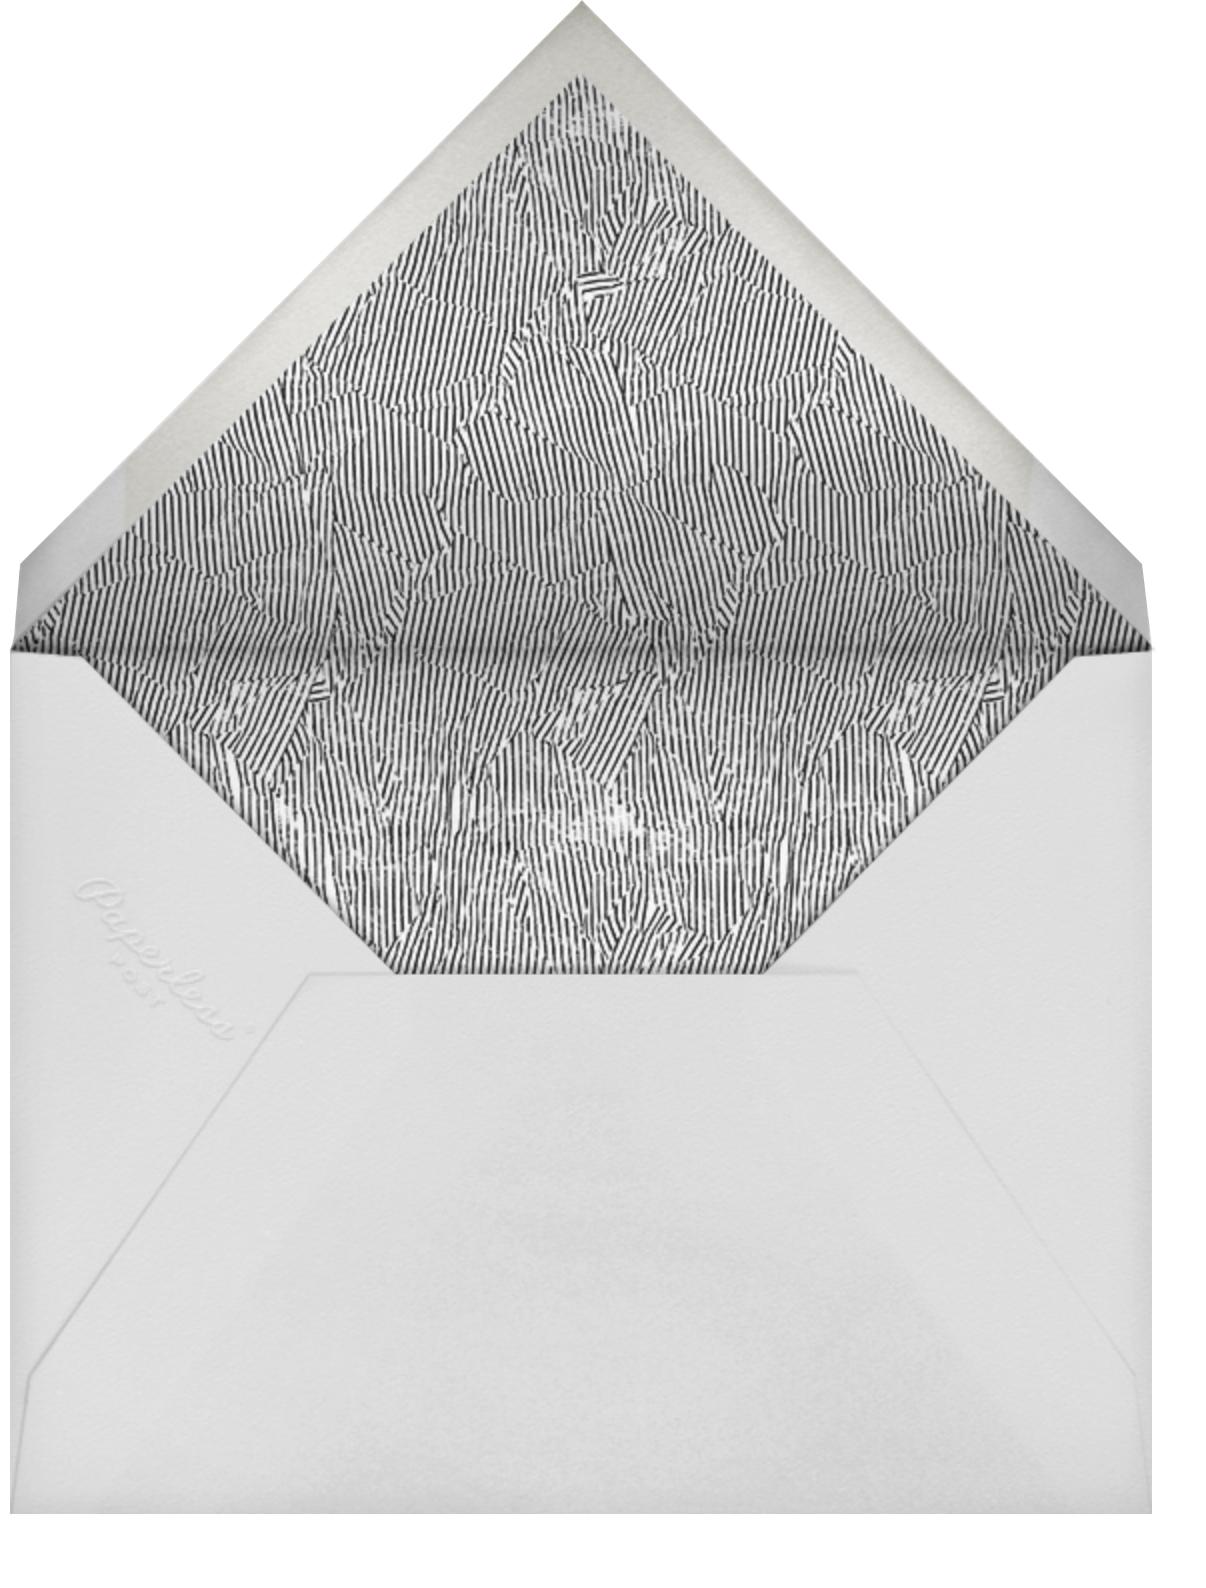 Covet - Champagne - Kelly Wearstler - Cocktail party - envelope back